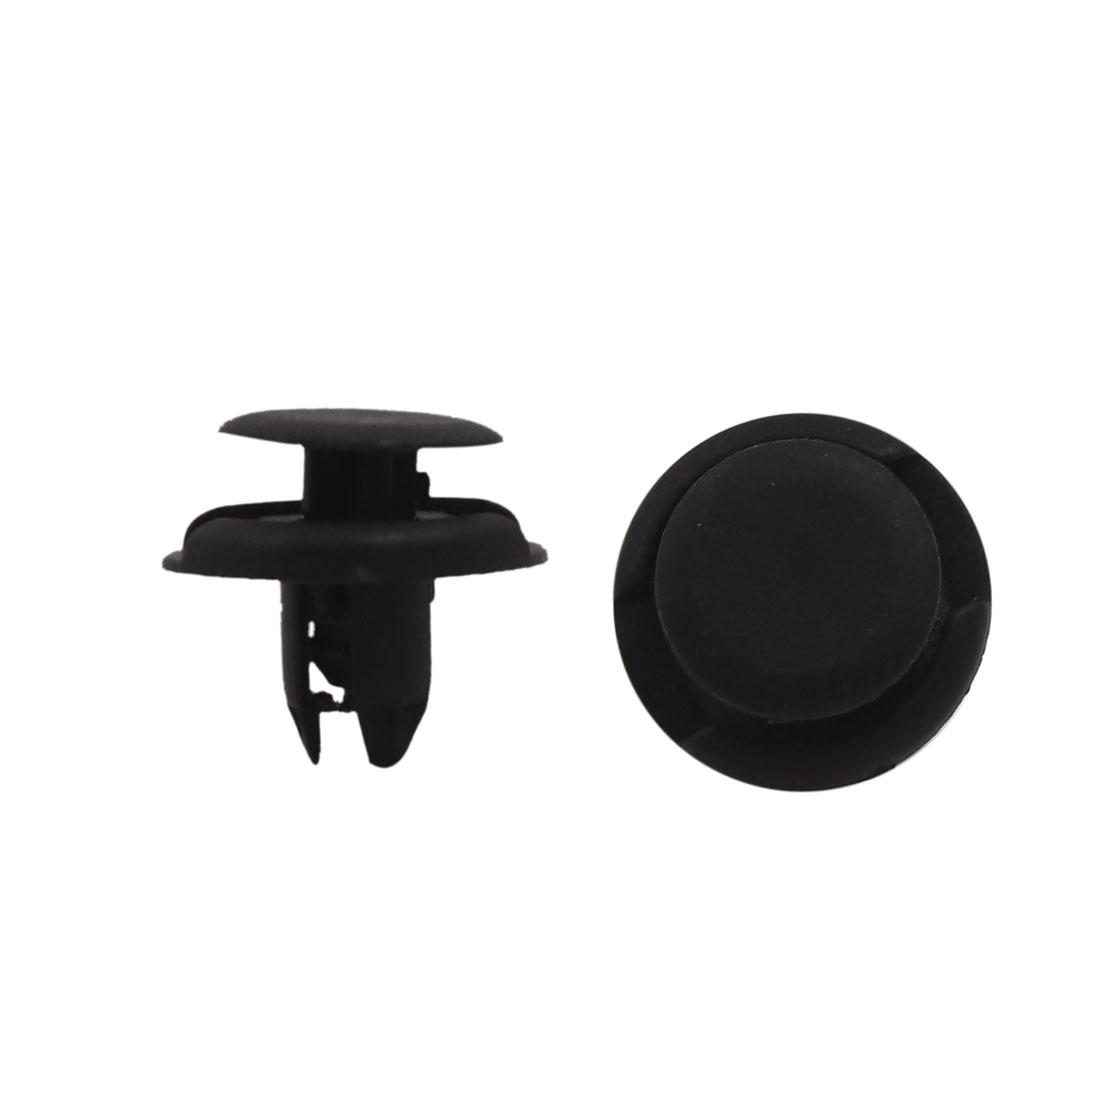 100 Pcs 8mm Hole 19mm Head Plastic Rivets Fastener Push Clips for Bumper Fender